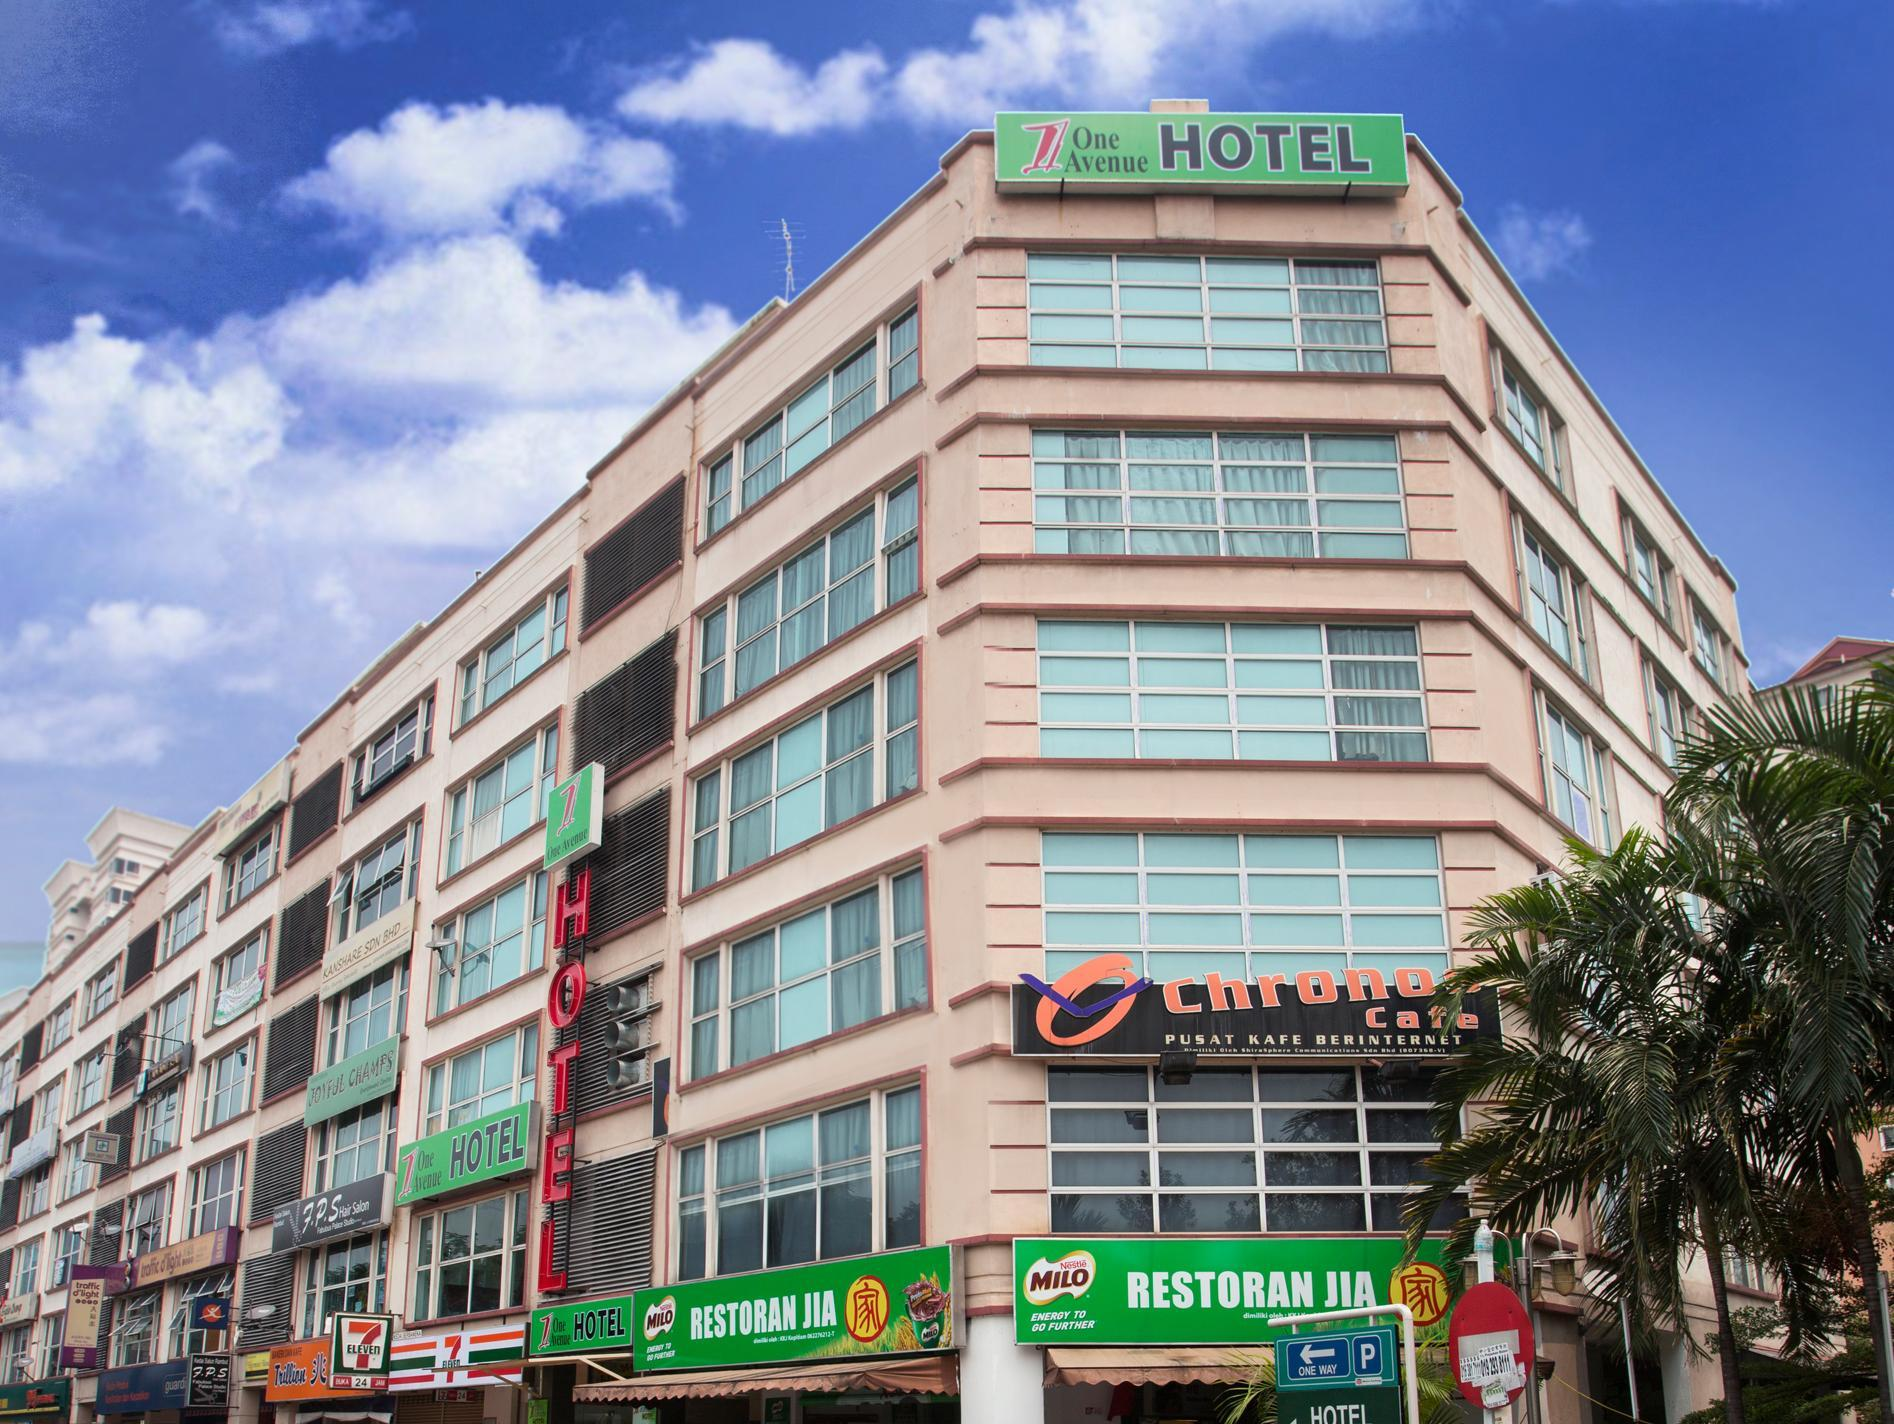 One Avenue Hotel 1